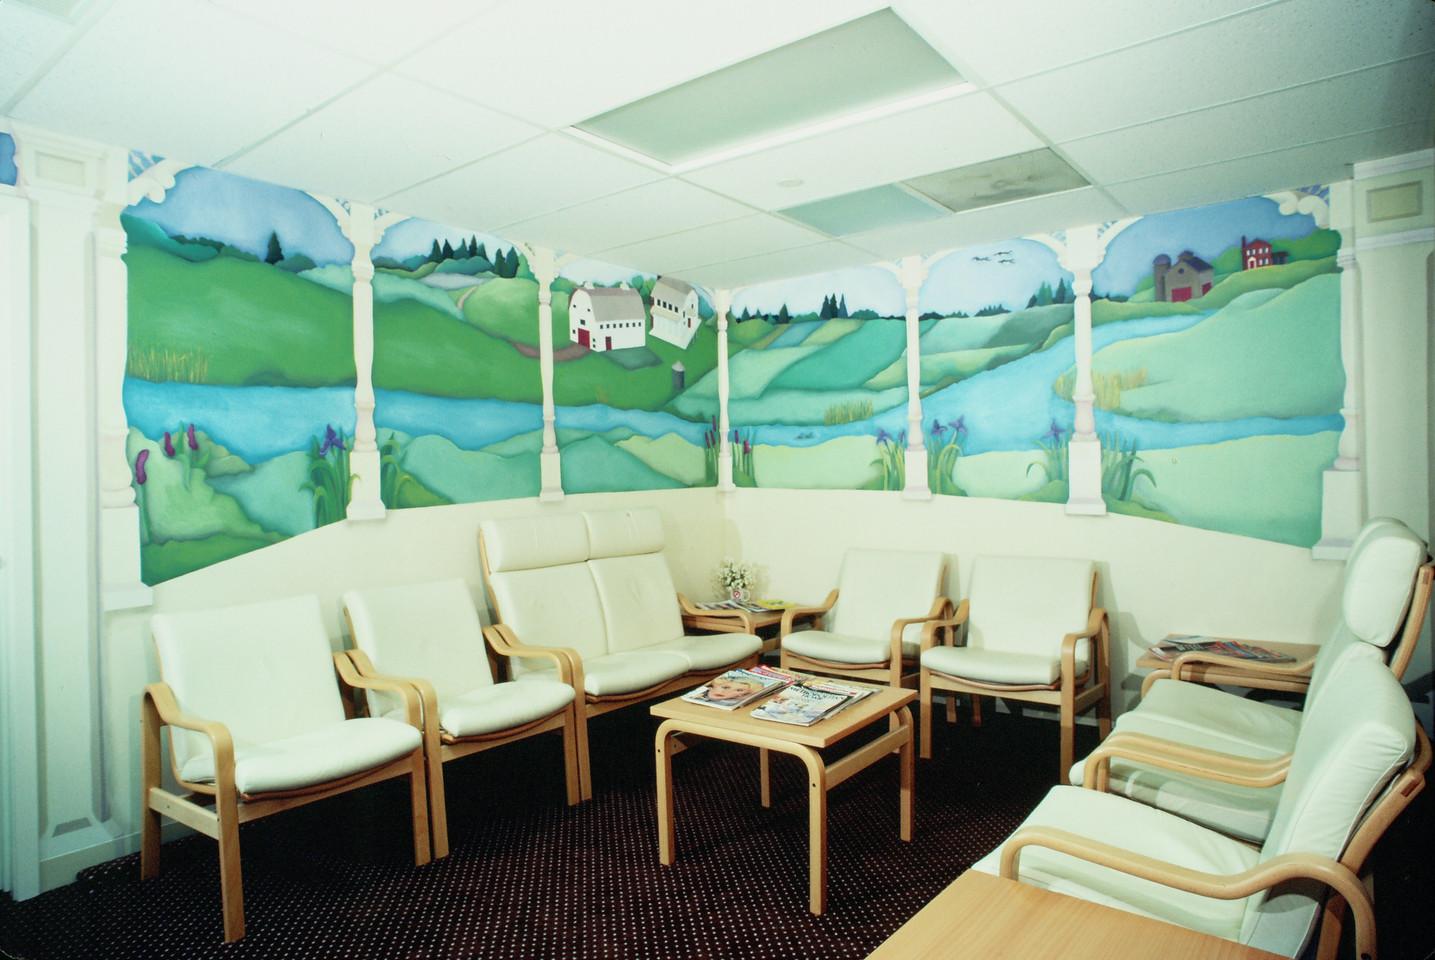 Hawthorne Place Surgery Center, Libertyville IL, 8' x 40